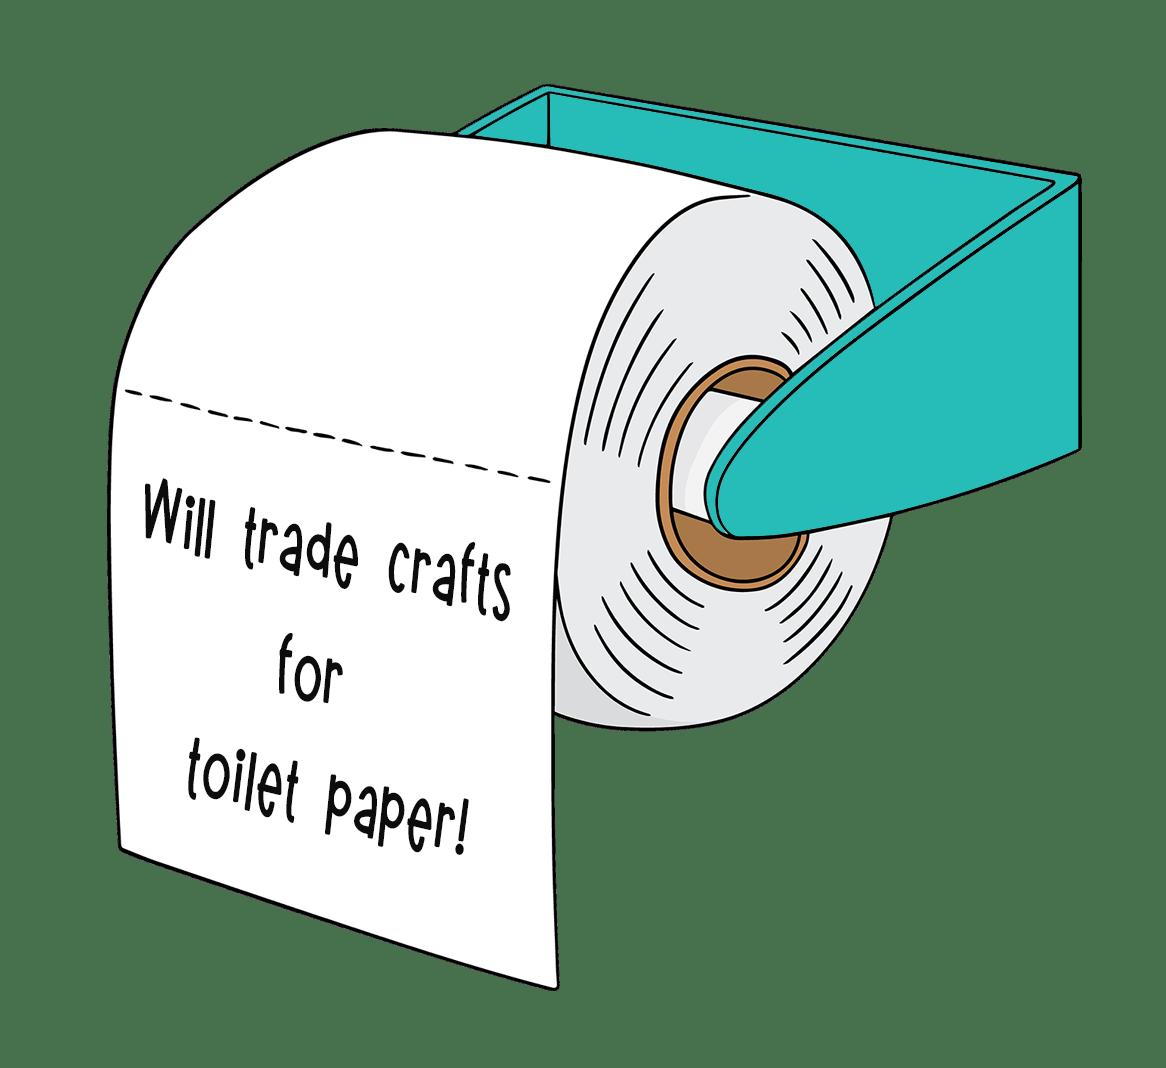 Toilet Paper Apocolypse